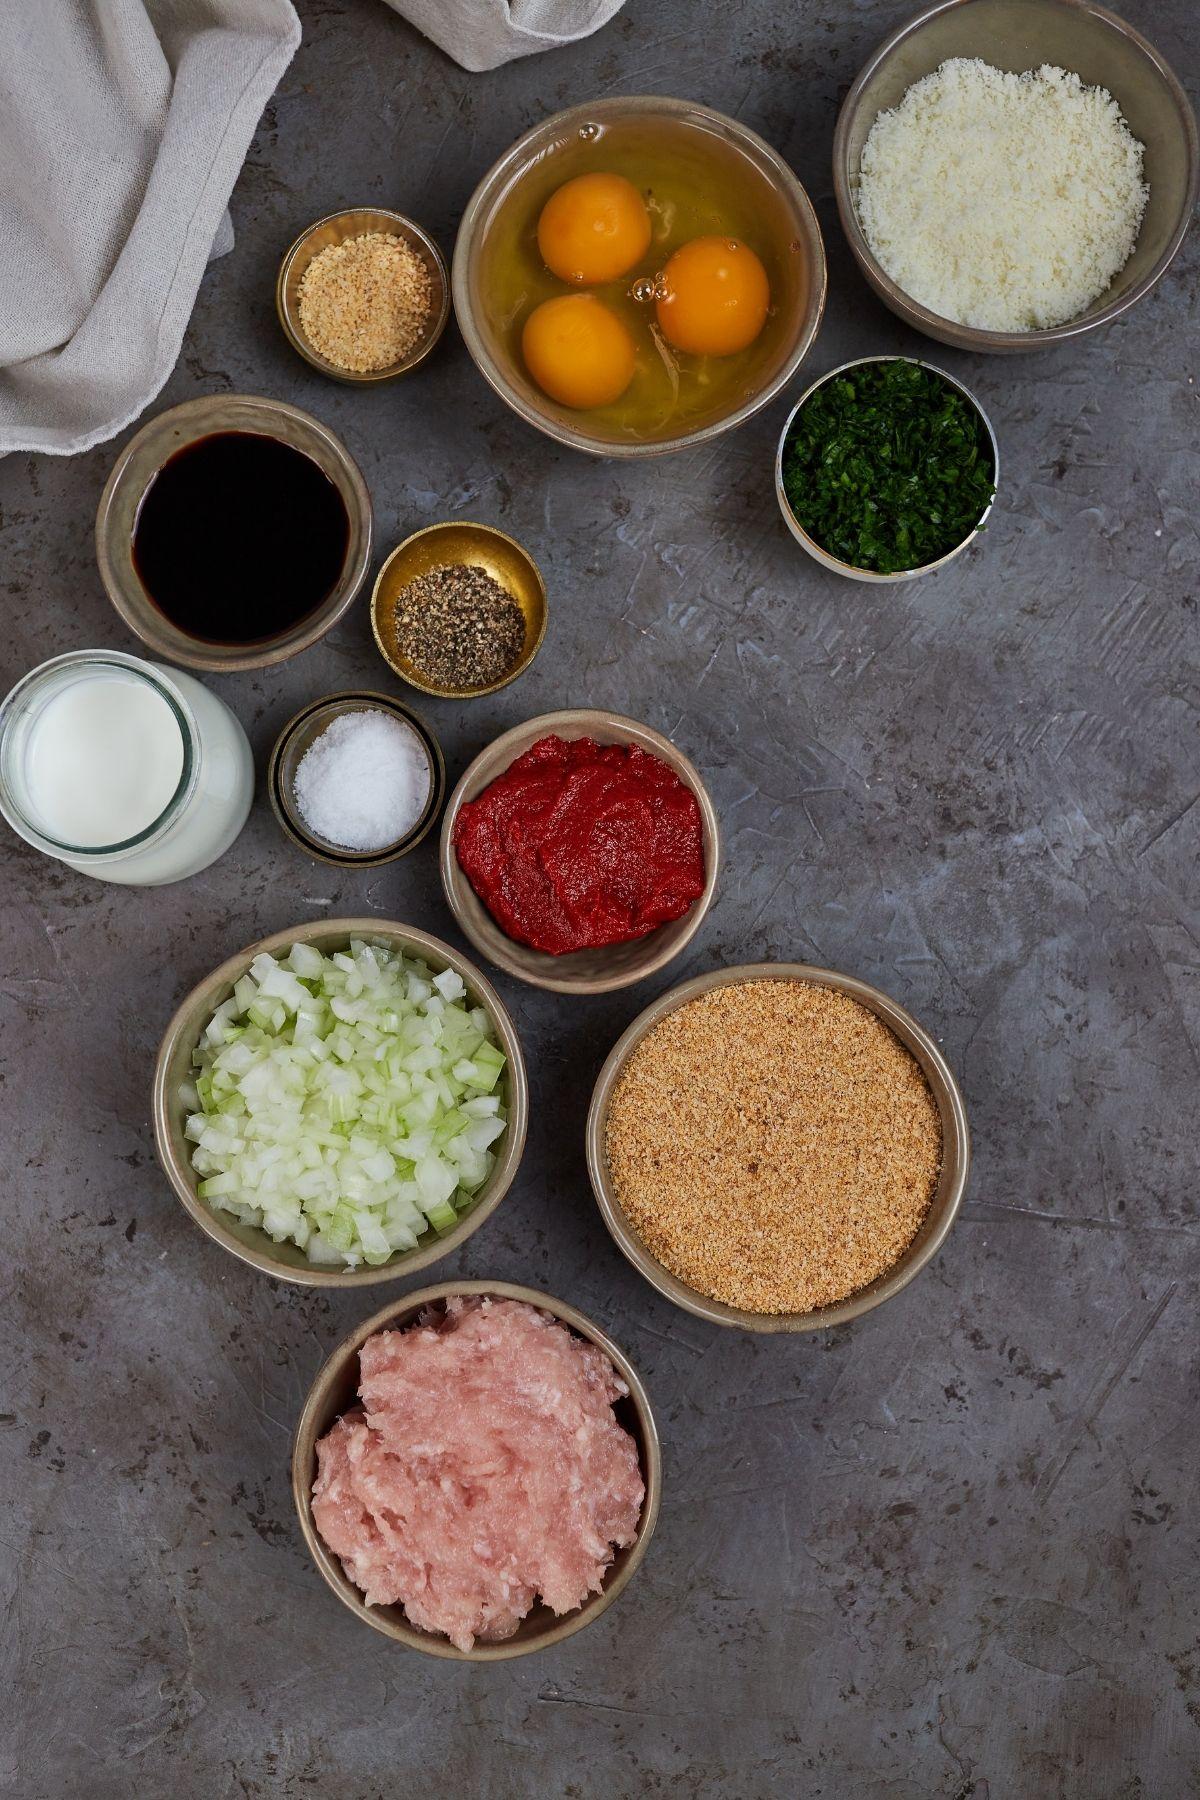 Ingredients for chicken meatloaf